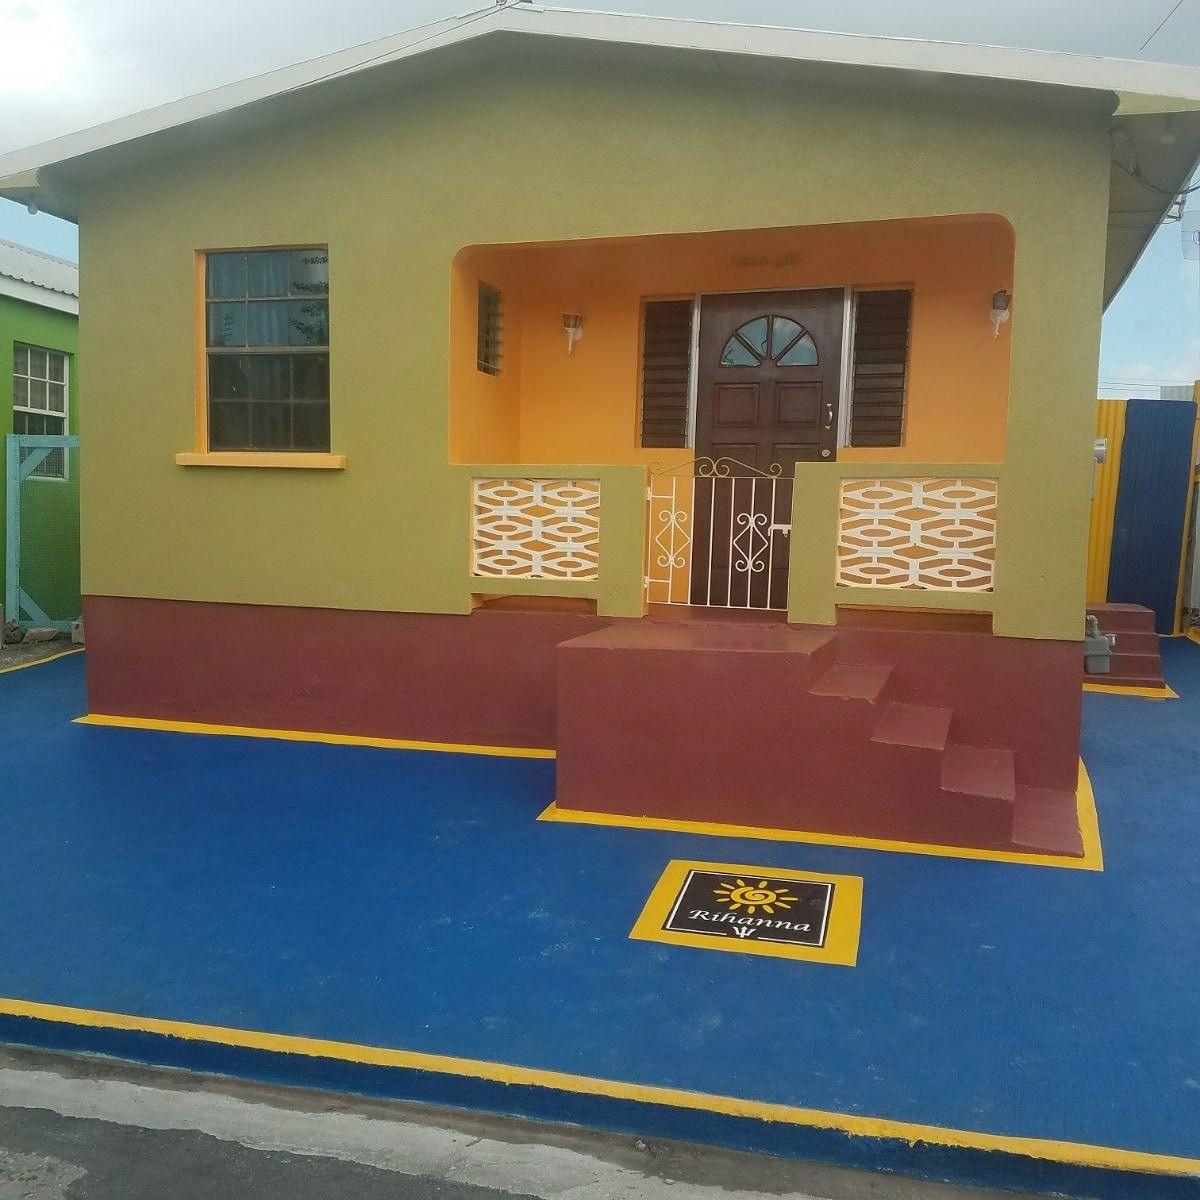 Rihannau0027s childhood home in St Michaelu0027s Parish